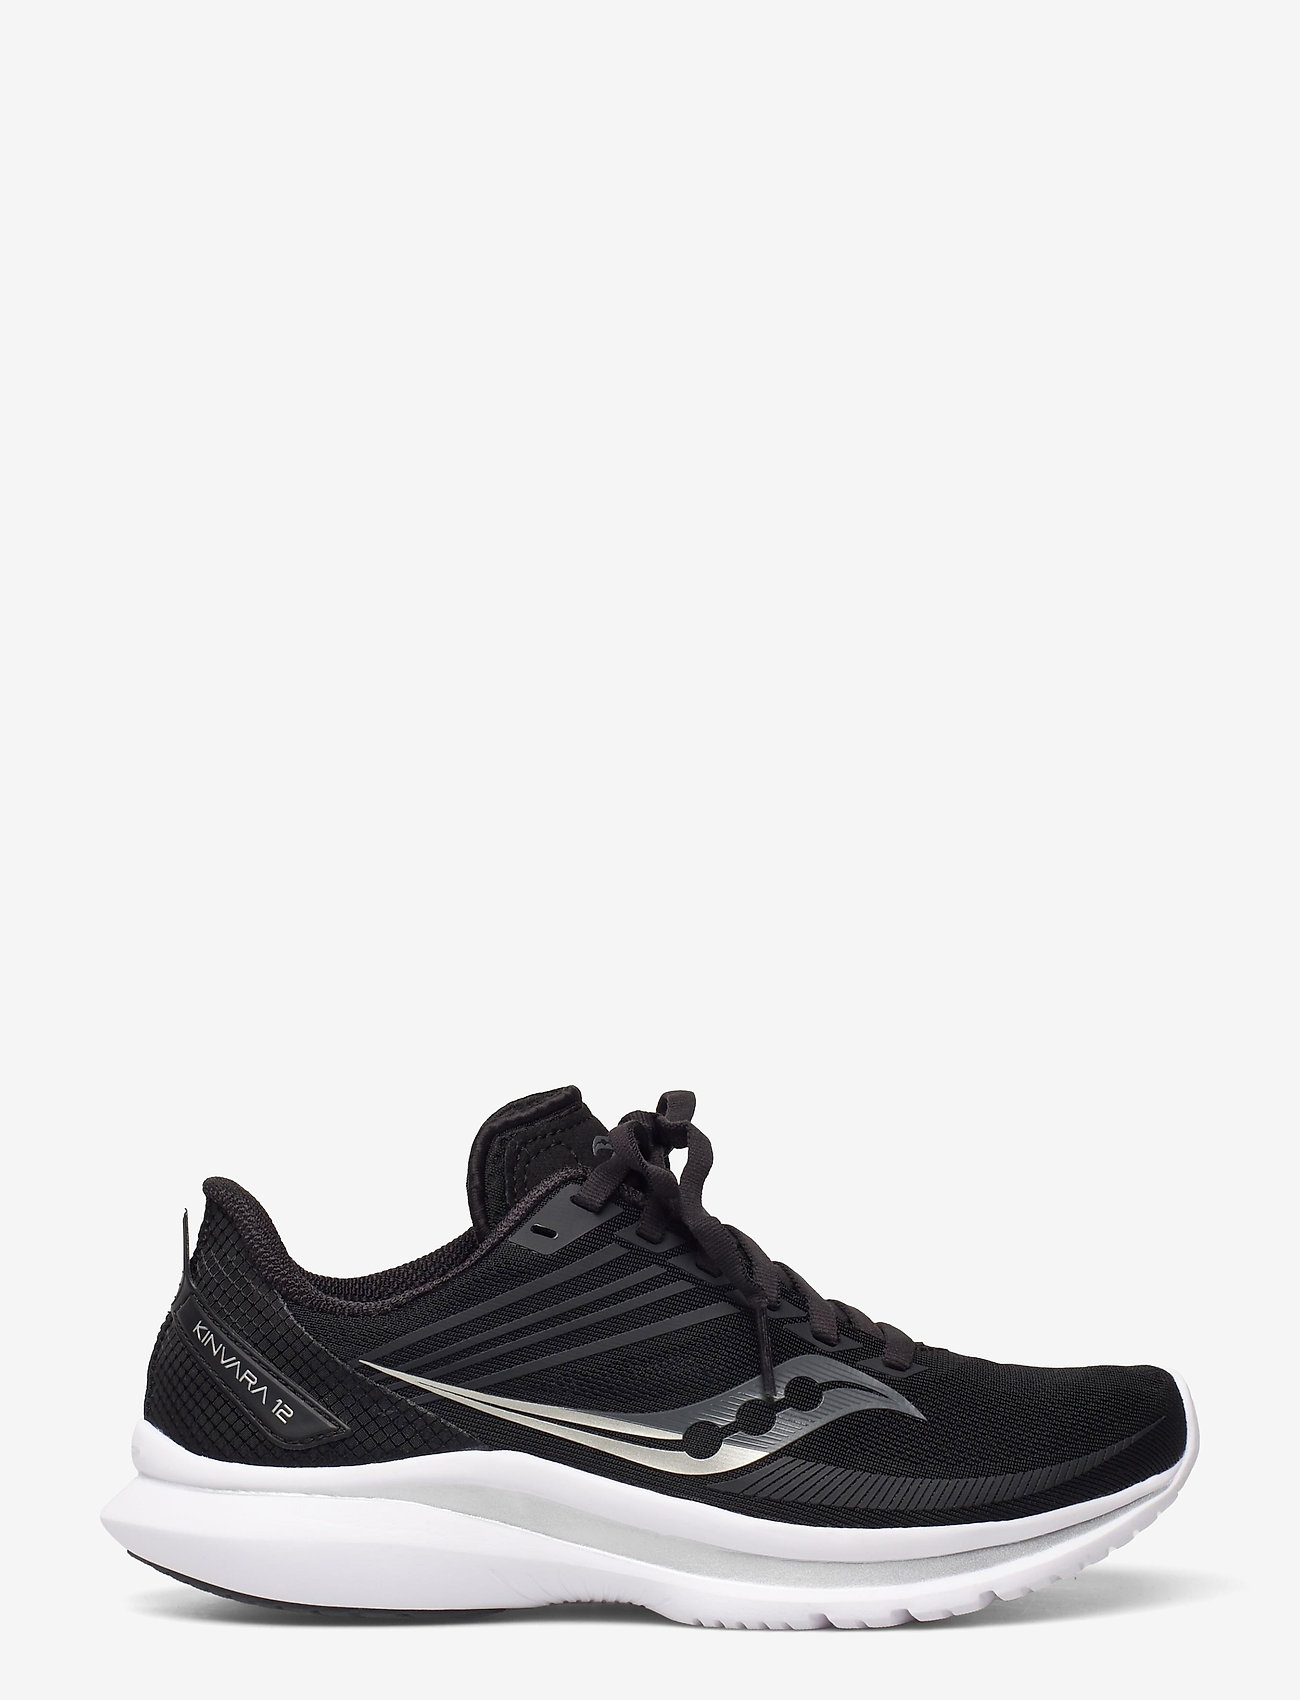 Saucony - KINVARA 12 - running shoes - black/silver - 1